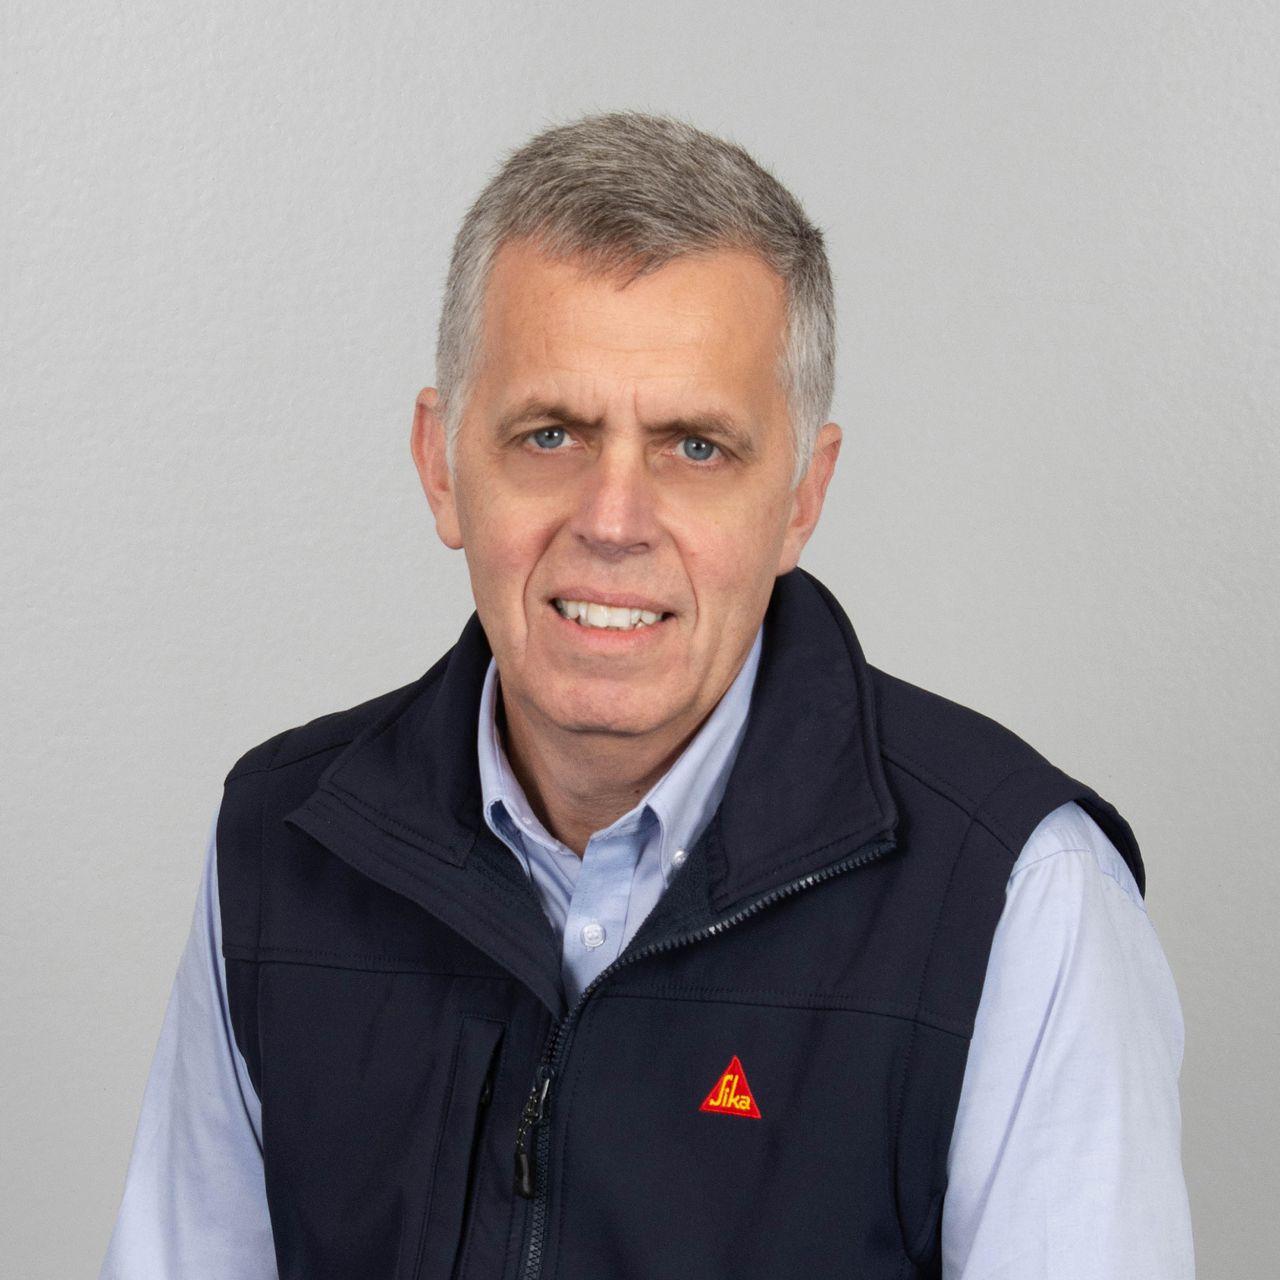 David Fitzpatrick, Target Market Manager - Industry, Sealing and Bonding, Sika Ireland